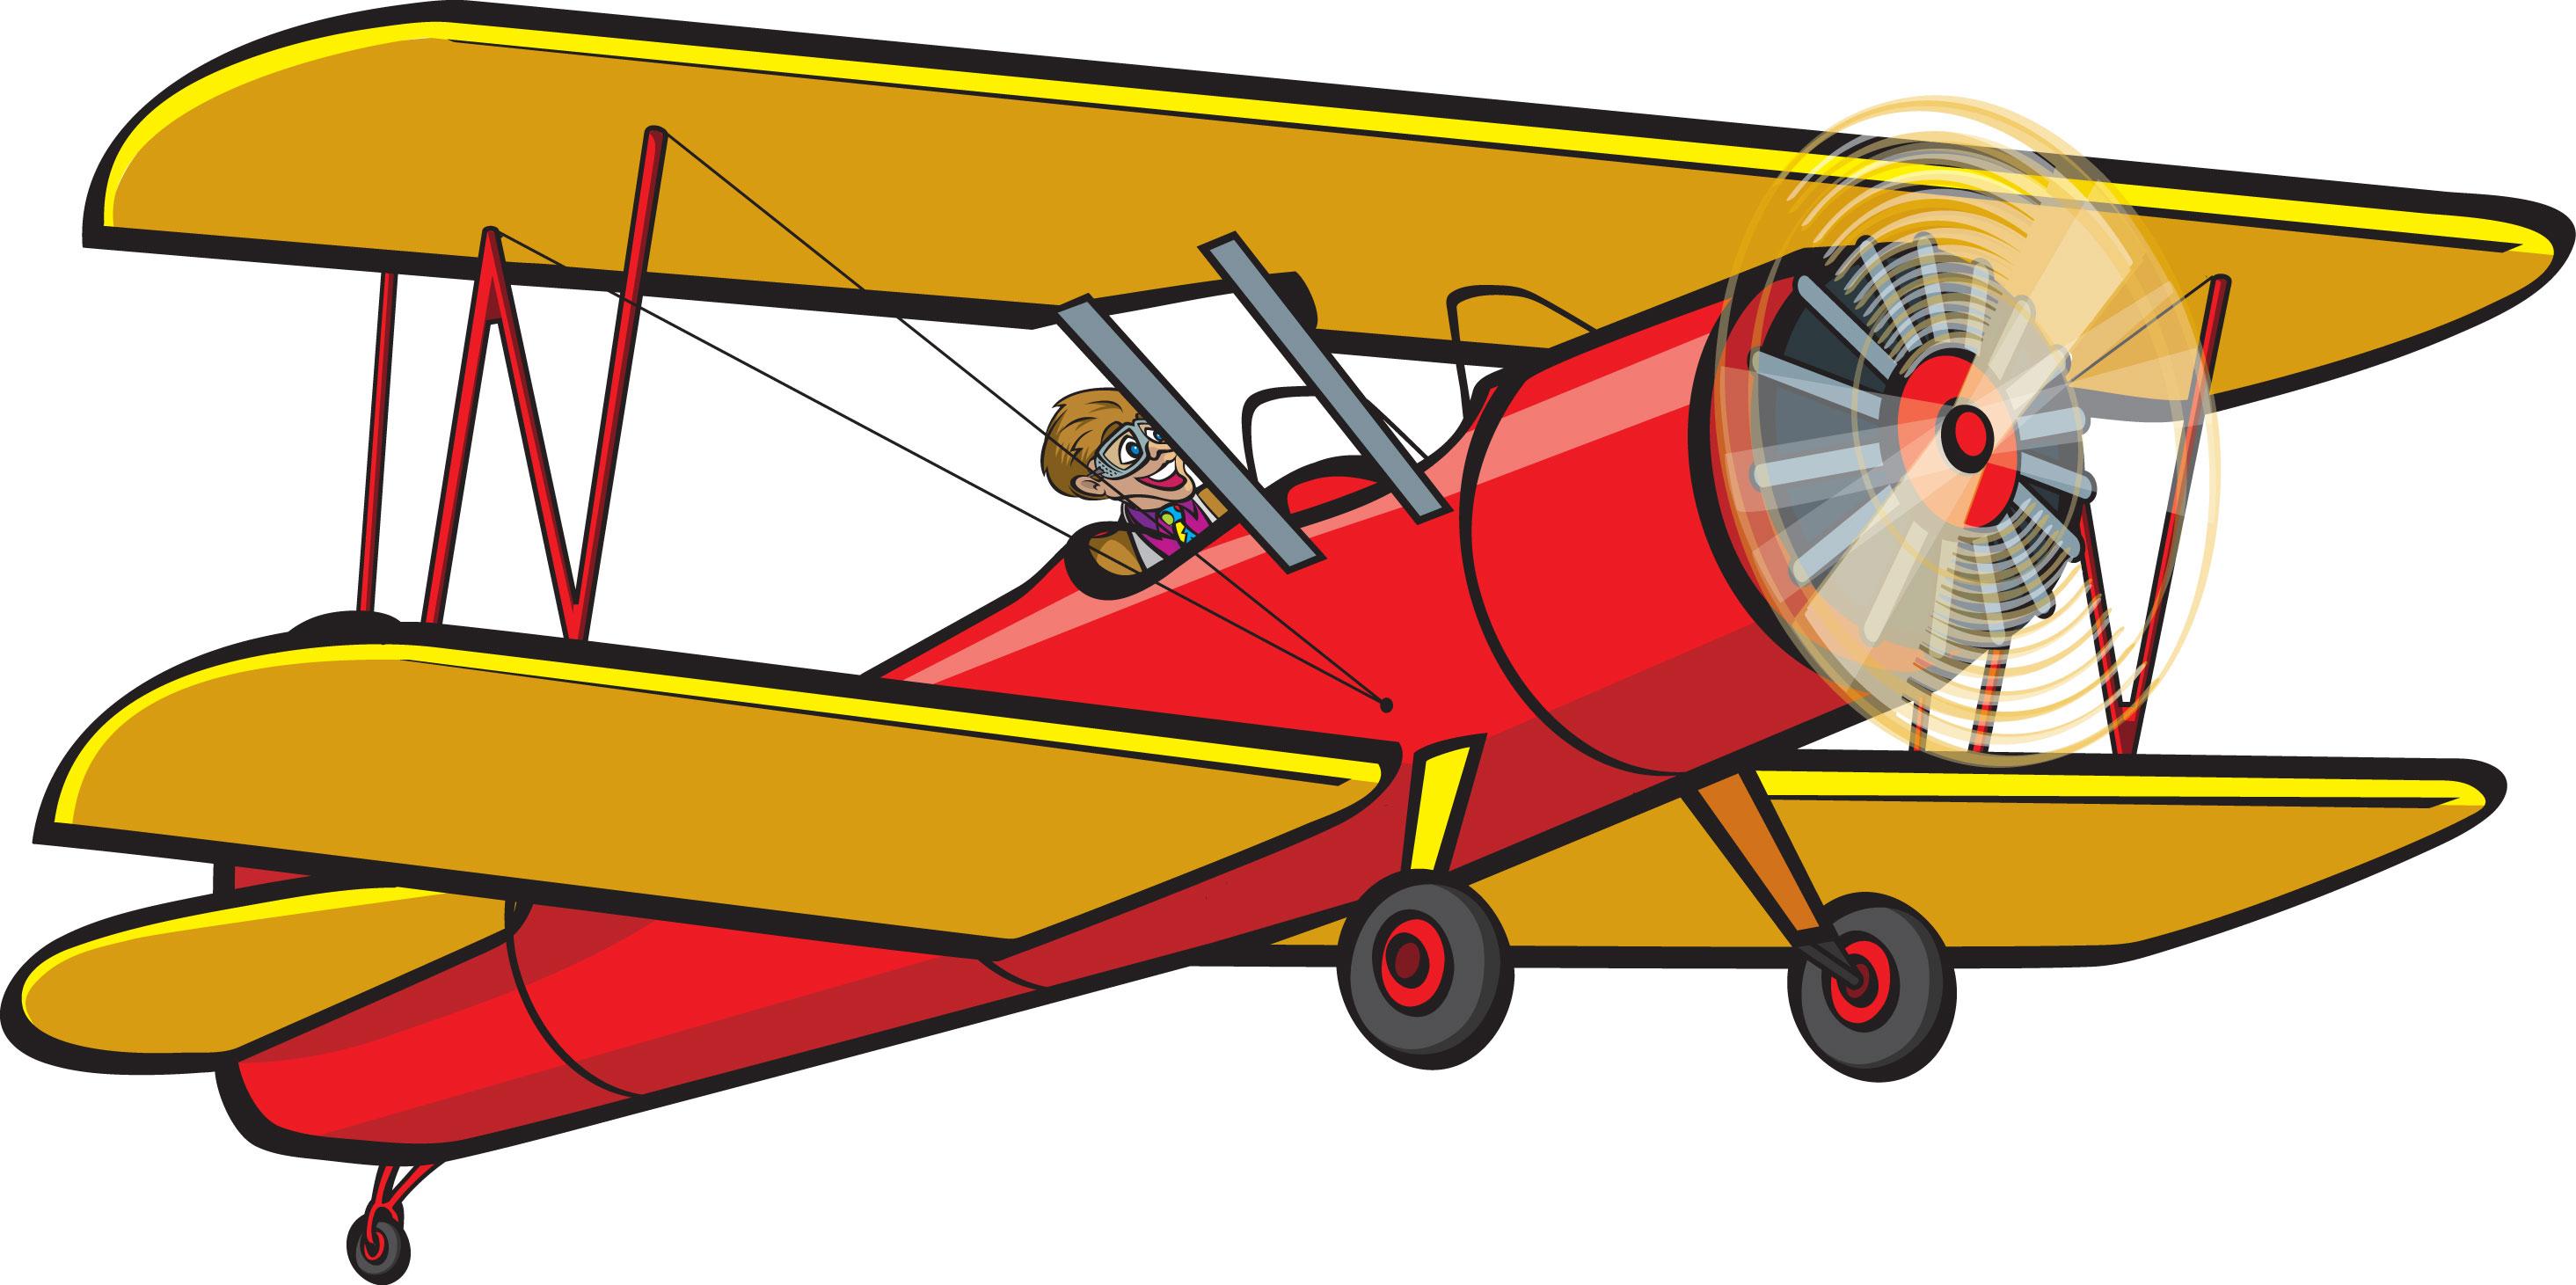 Free cliparts download clip. Biplane clipart